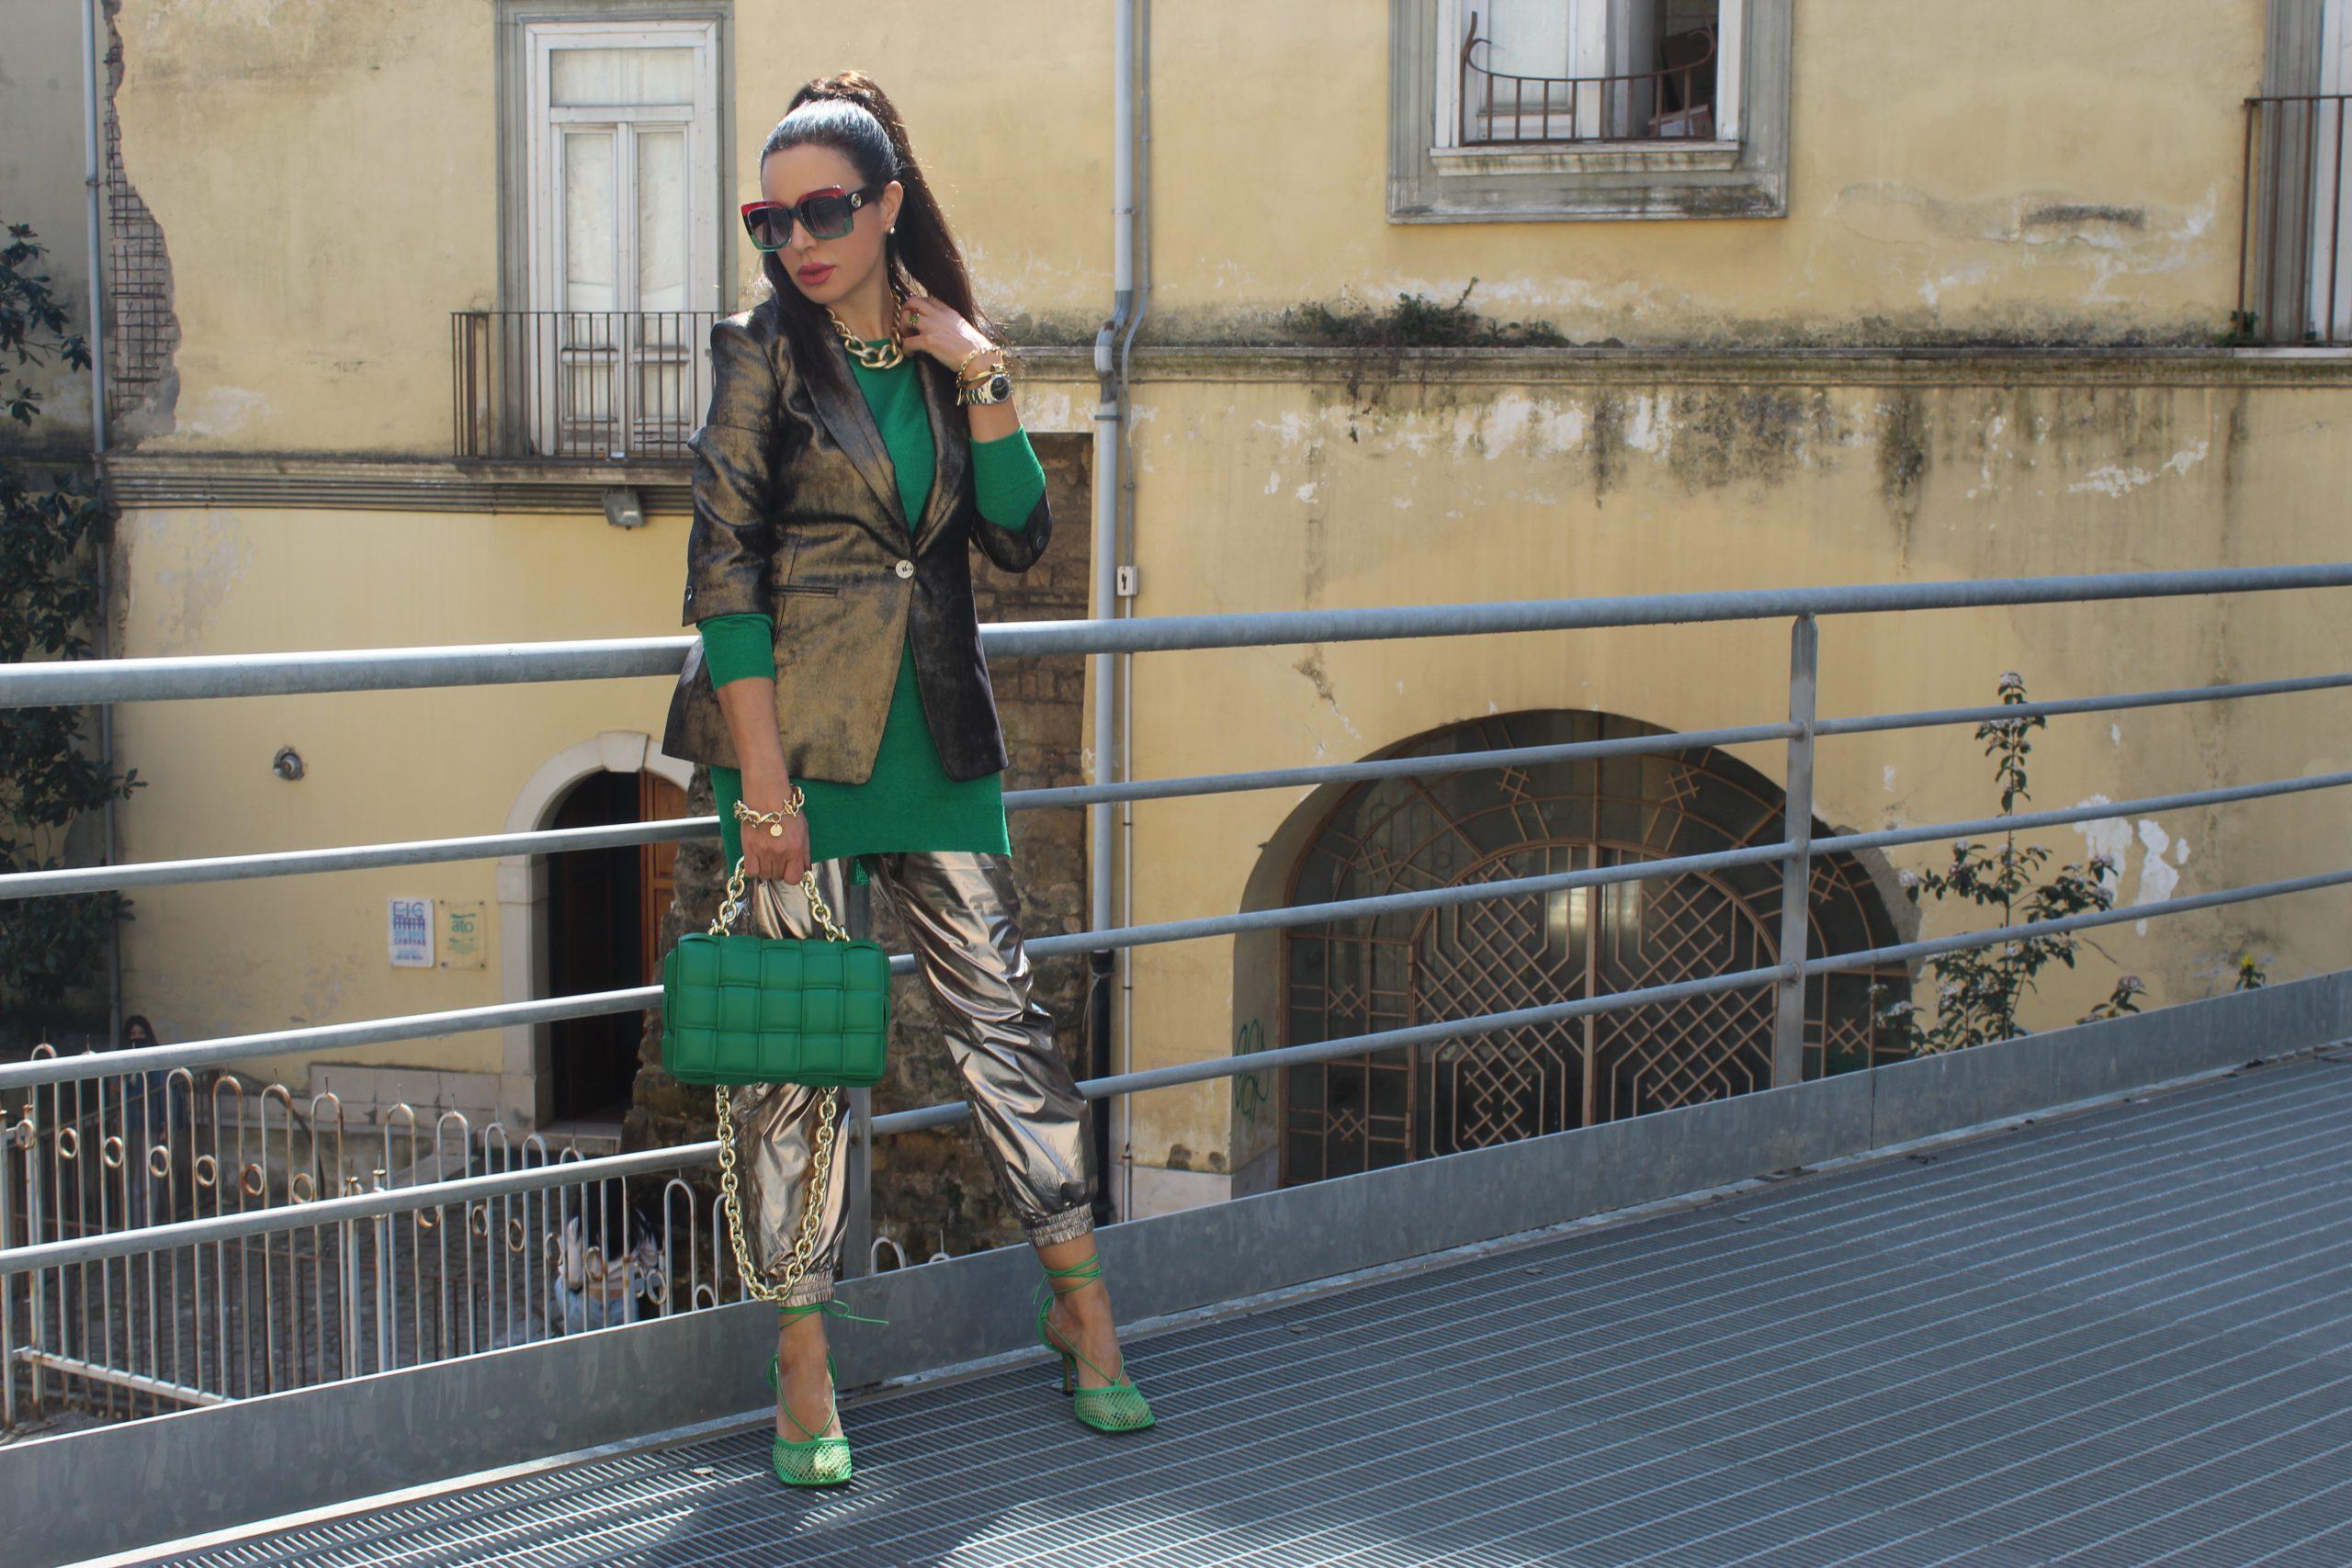 Metallic Trend Bottega Veneta Accessories Gold and Green Outfit Paola Lauretano